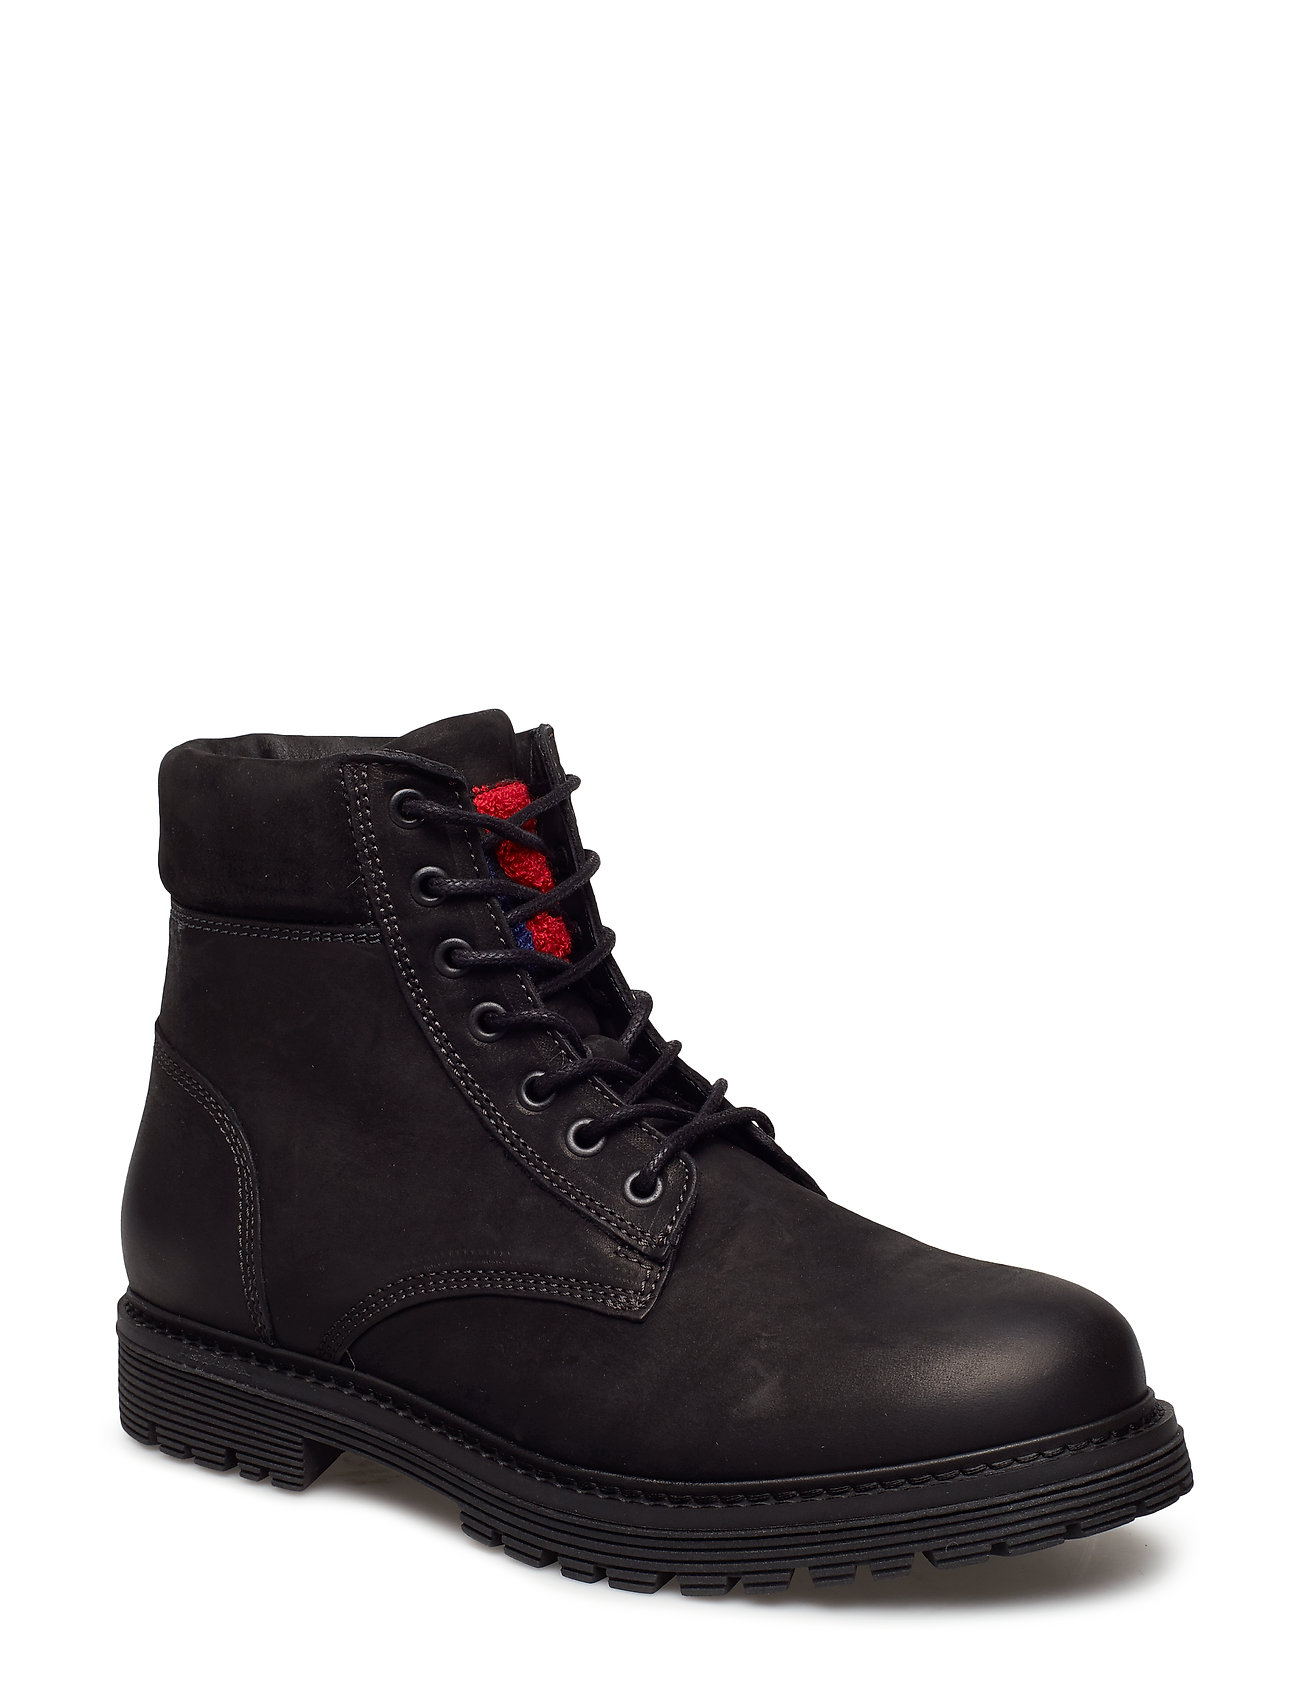 best service 876f6 dd8ee Tommy Hilfiger Louis 7n2 BLACK, hinta 195 €